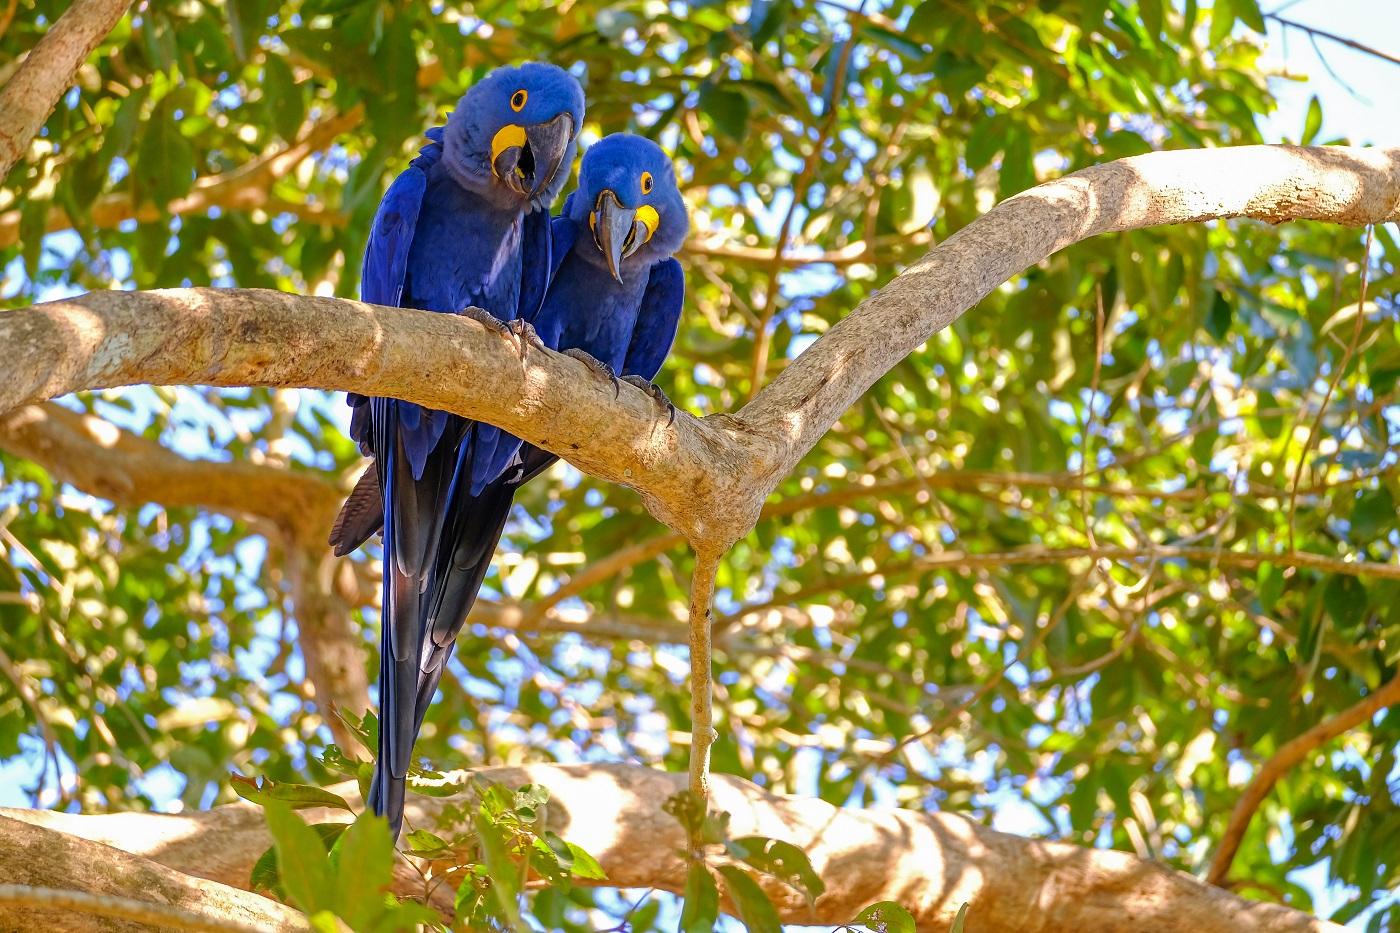 BRA_Pantanal_HyacinthMacaw_iStock-1129116558